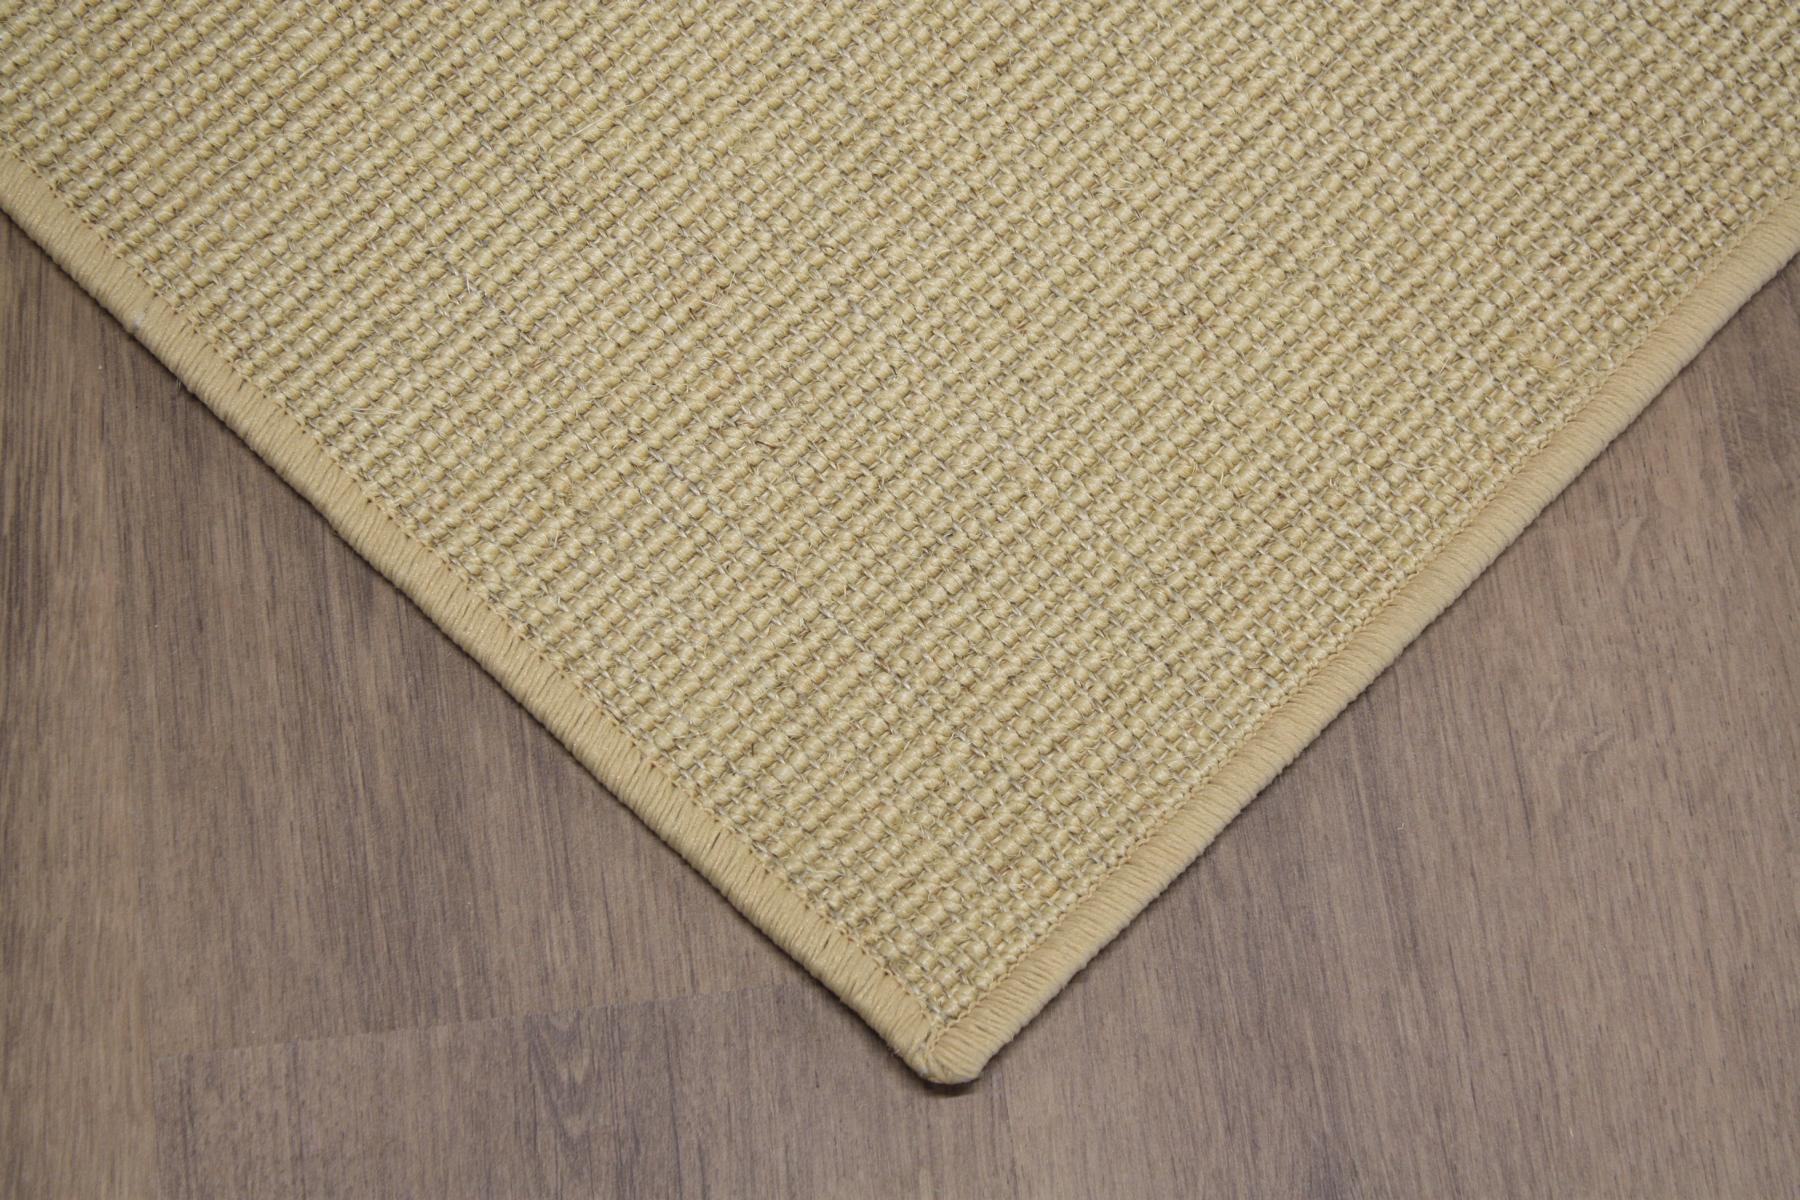 Sisal tapis surfil riz 200x200cm 100 sisal boucle ebay - Tapis en sisal ...